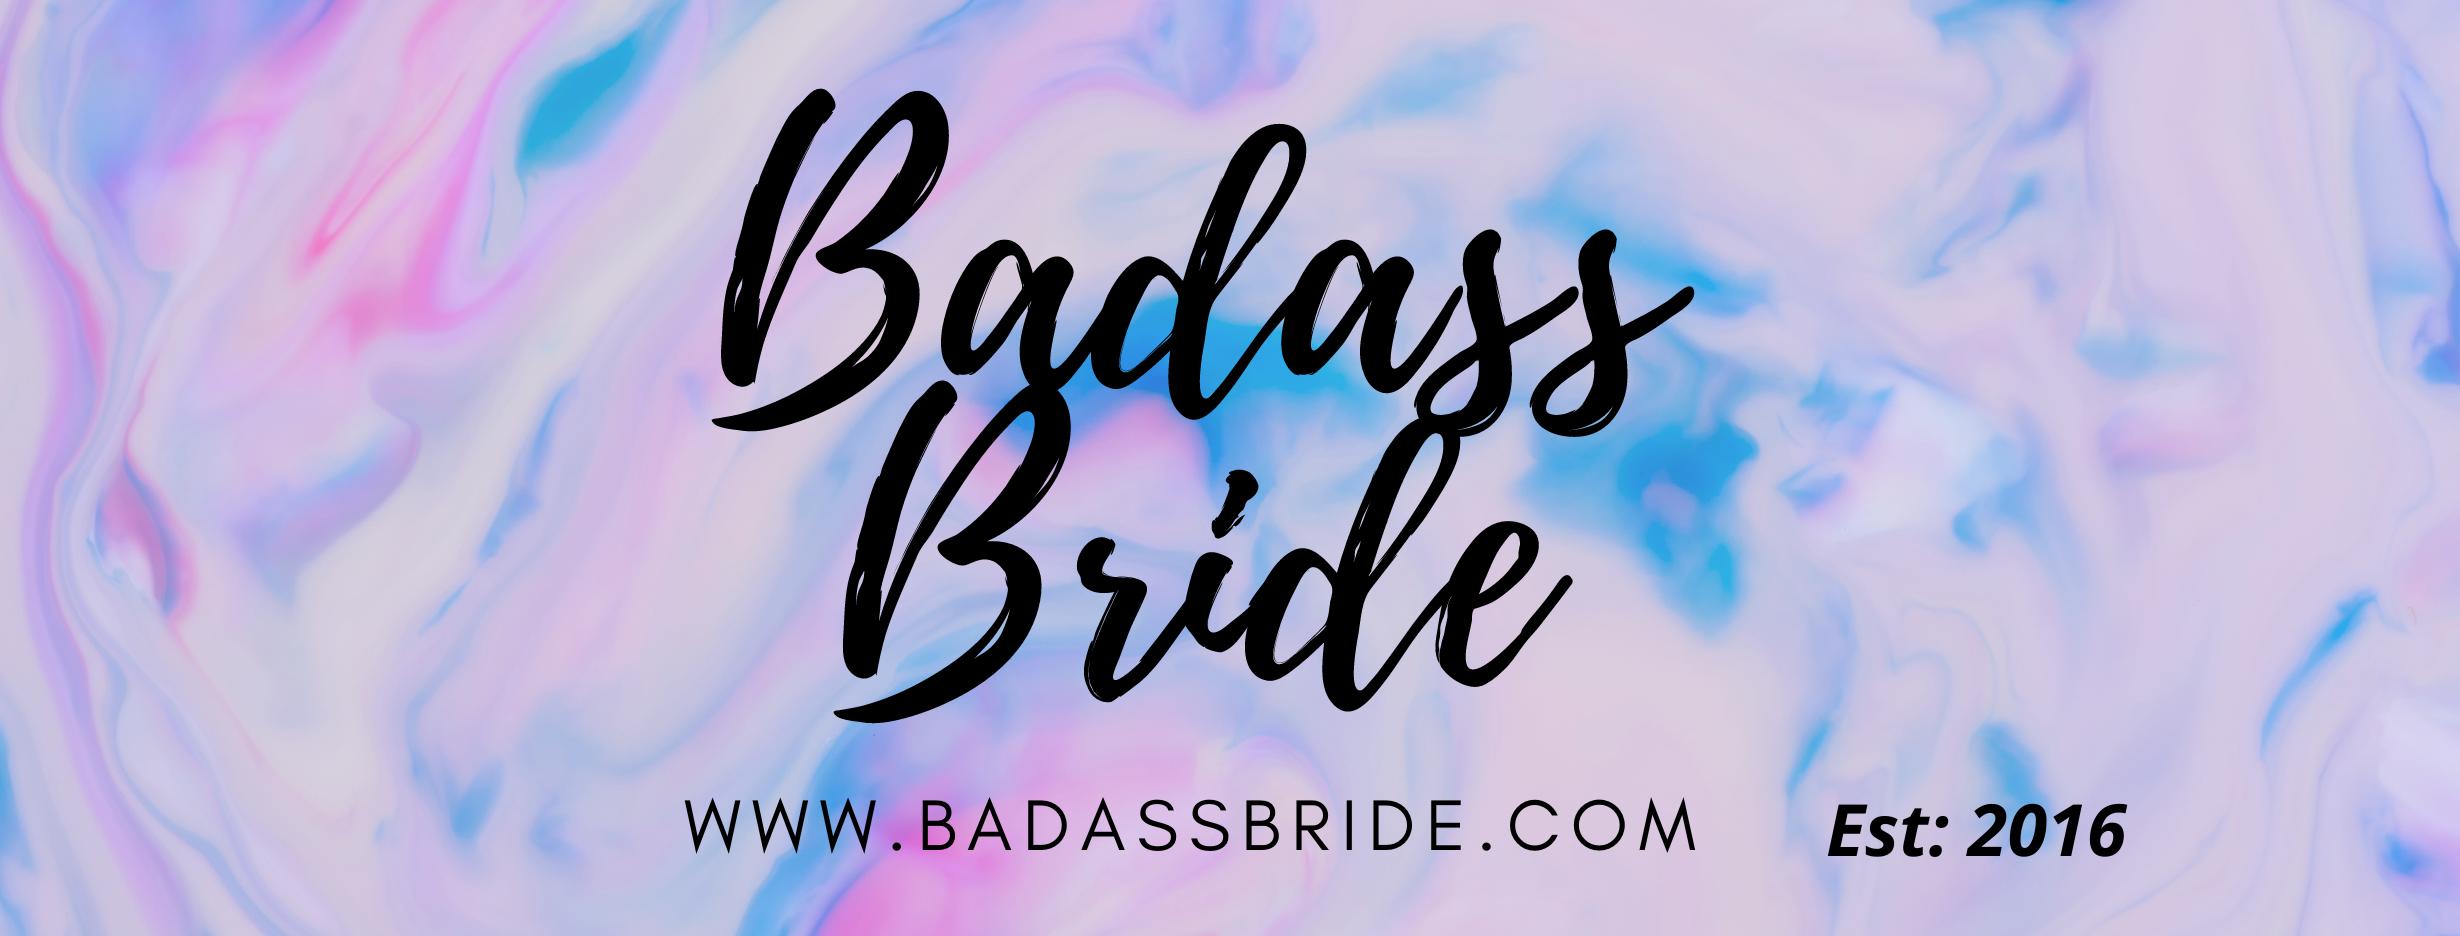 Badass Bride Unique wedding ideas